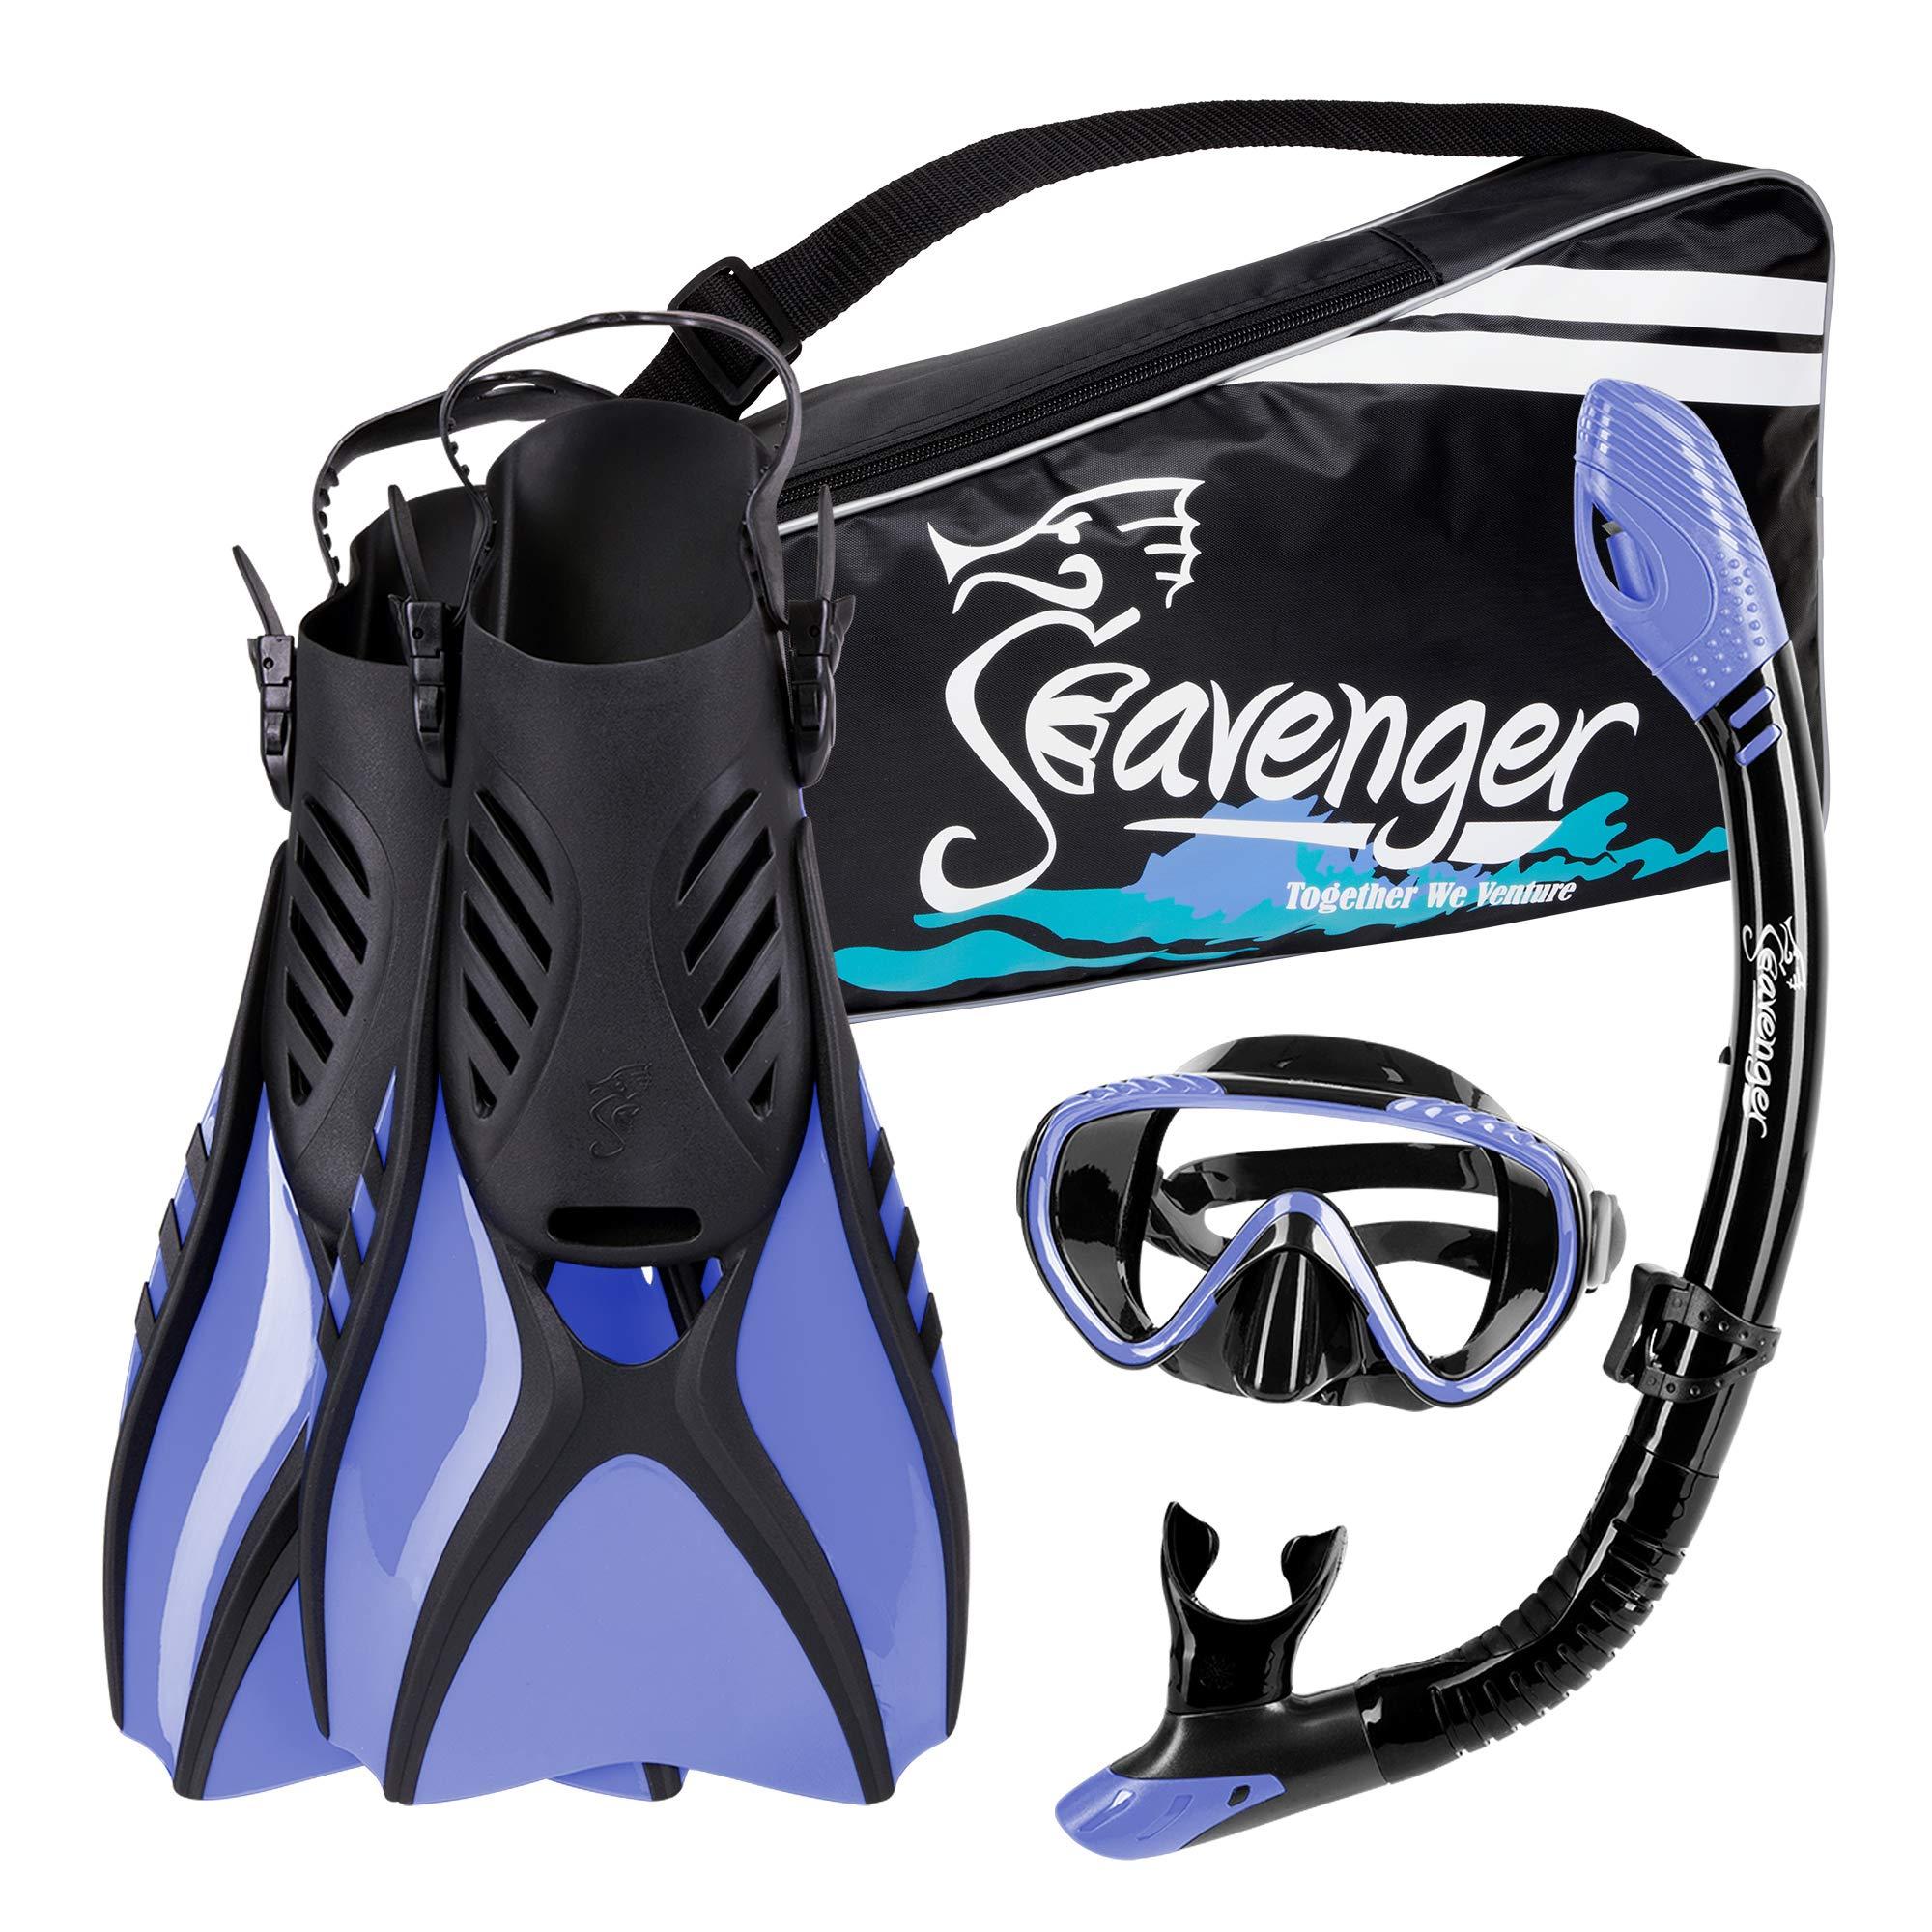 Seavenger Voyager Snorkeling Set   Travel Fins, Snorkel, Mask and Gear Bag for Men and Women (Black Silicone/Periwinkle, Medium) by Seavenger